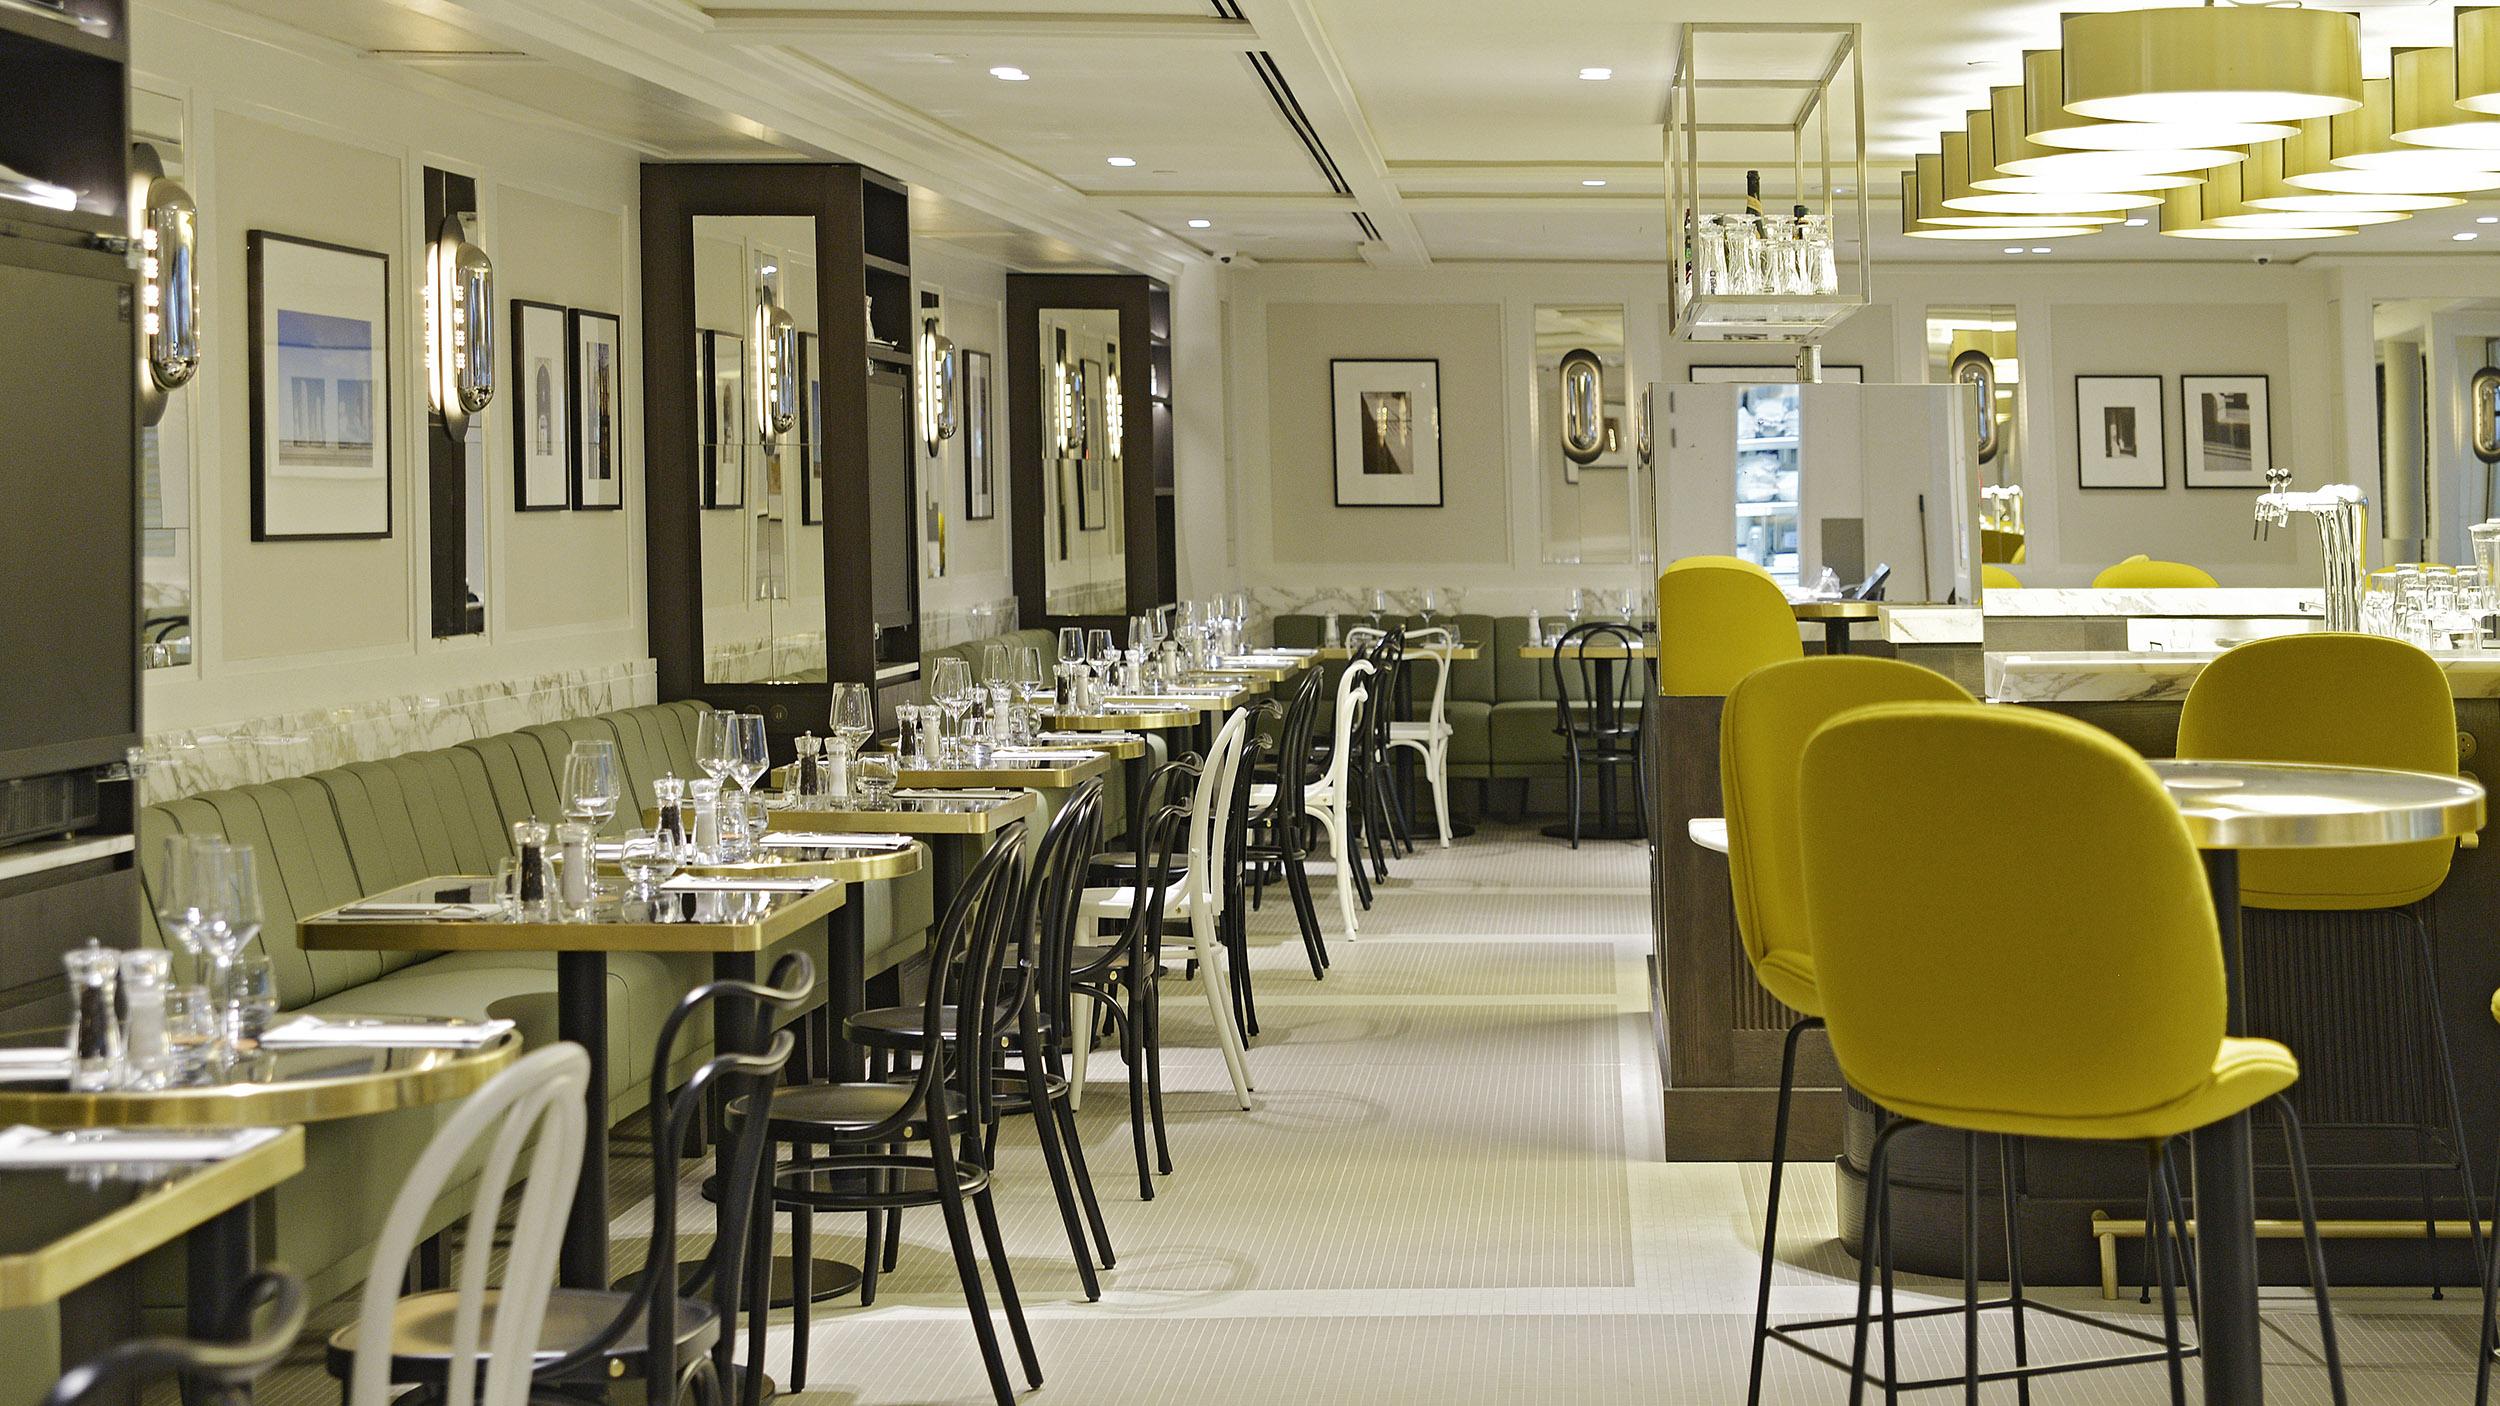 Chef Du Nouvelle French Une Avec Guy Offre The Table TasteAreas 5RL4j3A